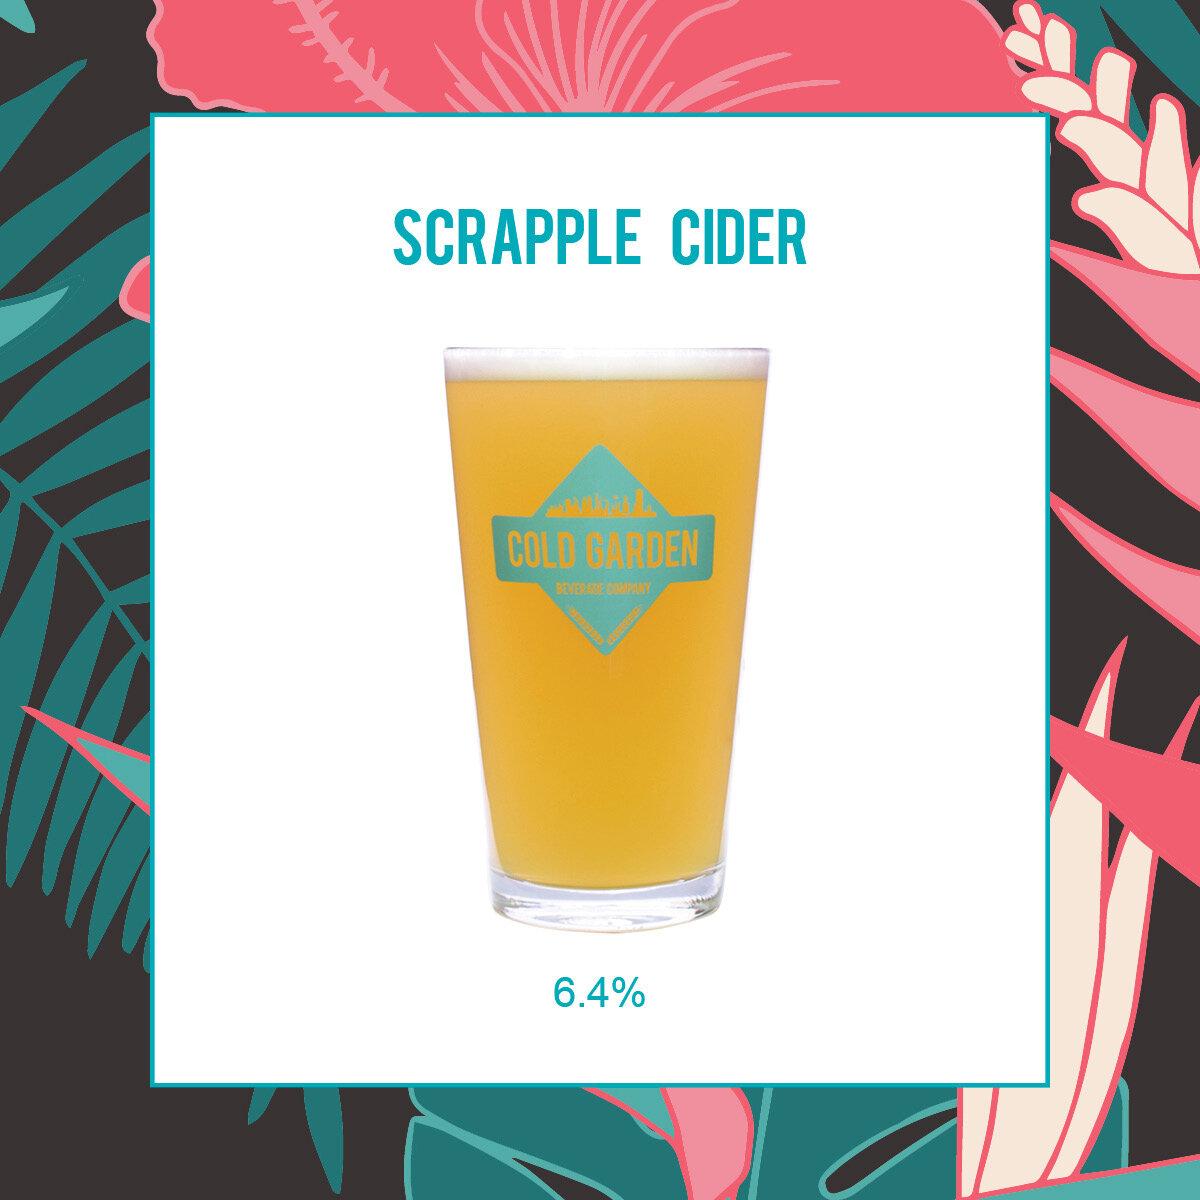 Scrapple Cider  Cold Garden Beverage Company